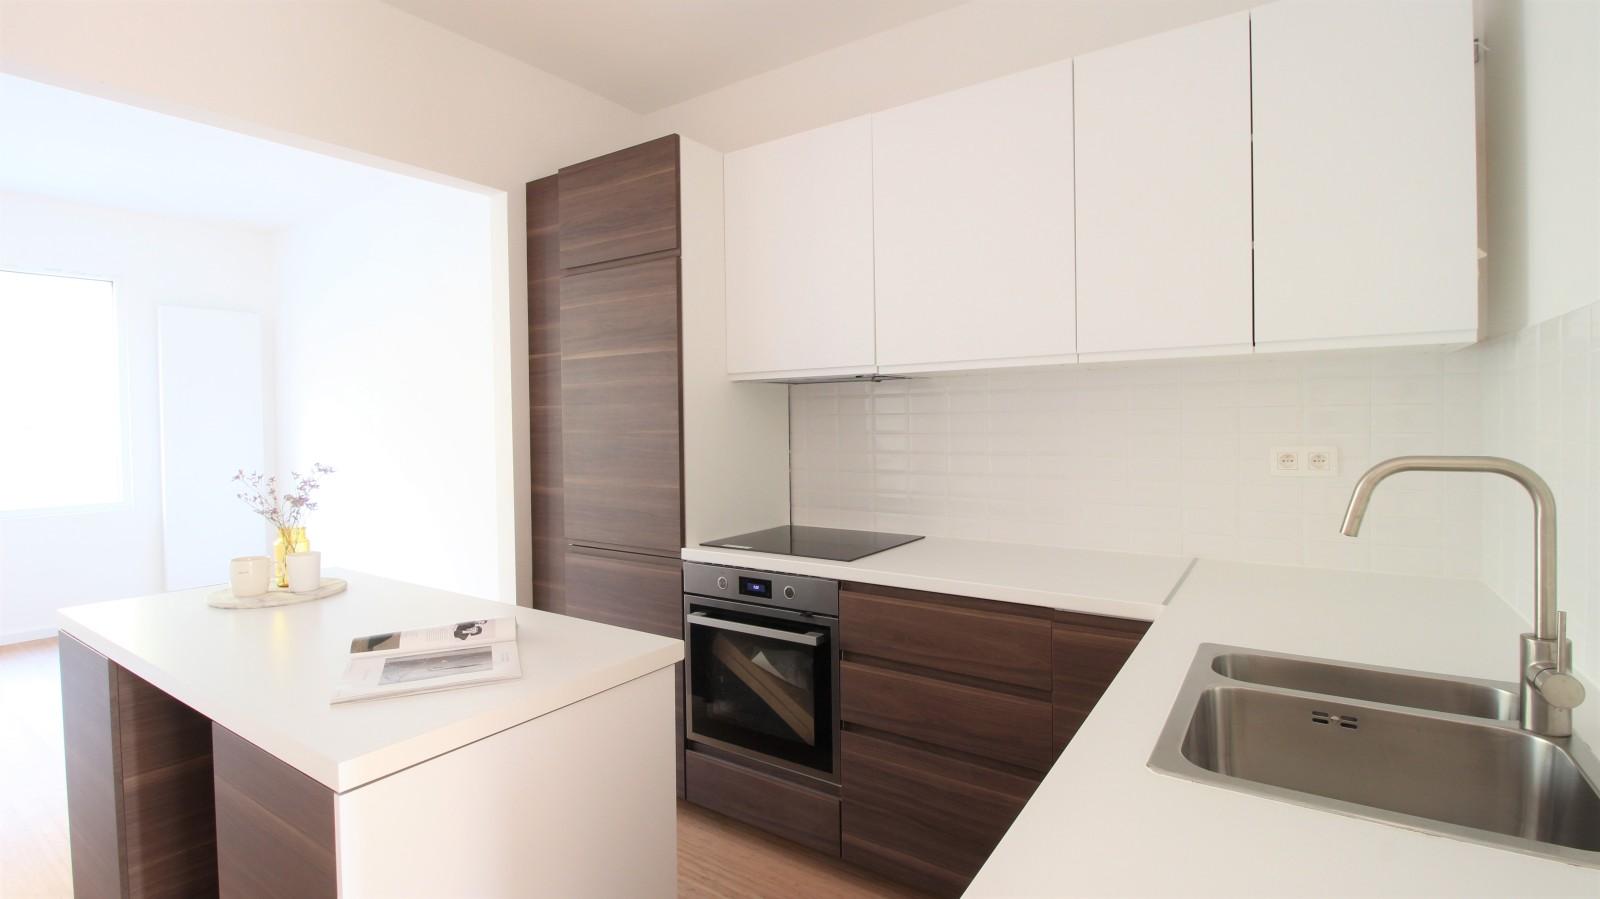 Gerenoveerd appartement met twee slaapkamers op centrale ligging te Mortsel! afbeelding 4